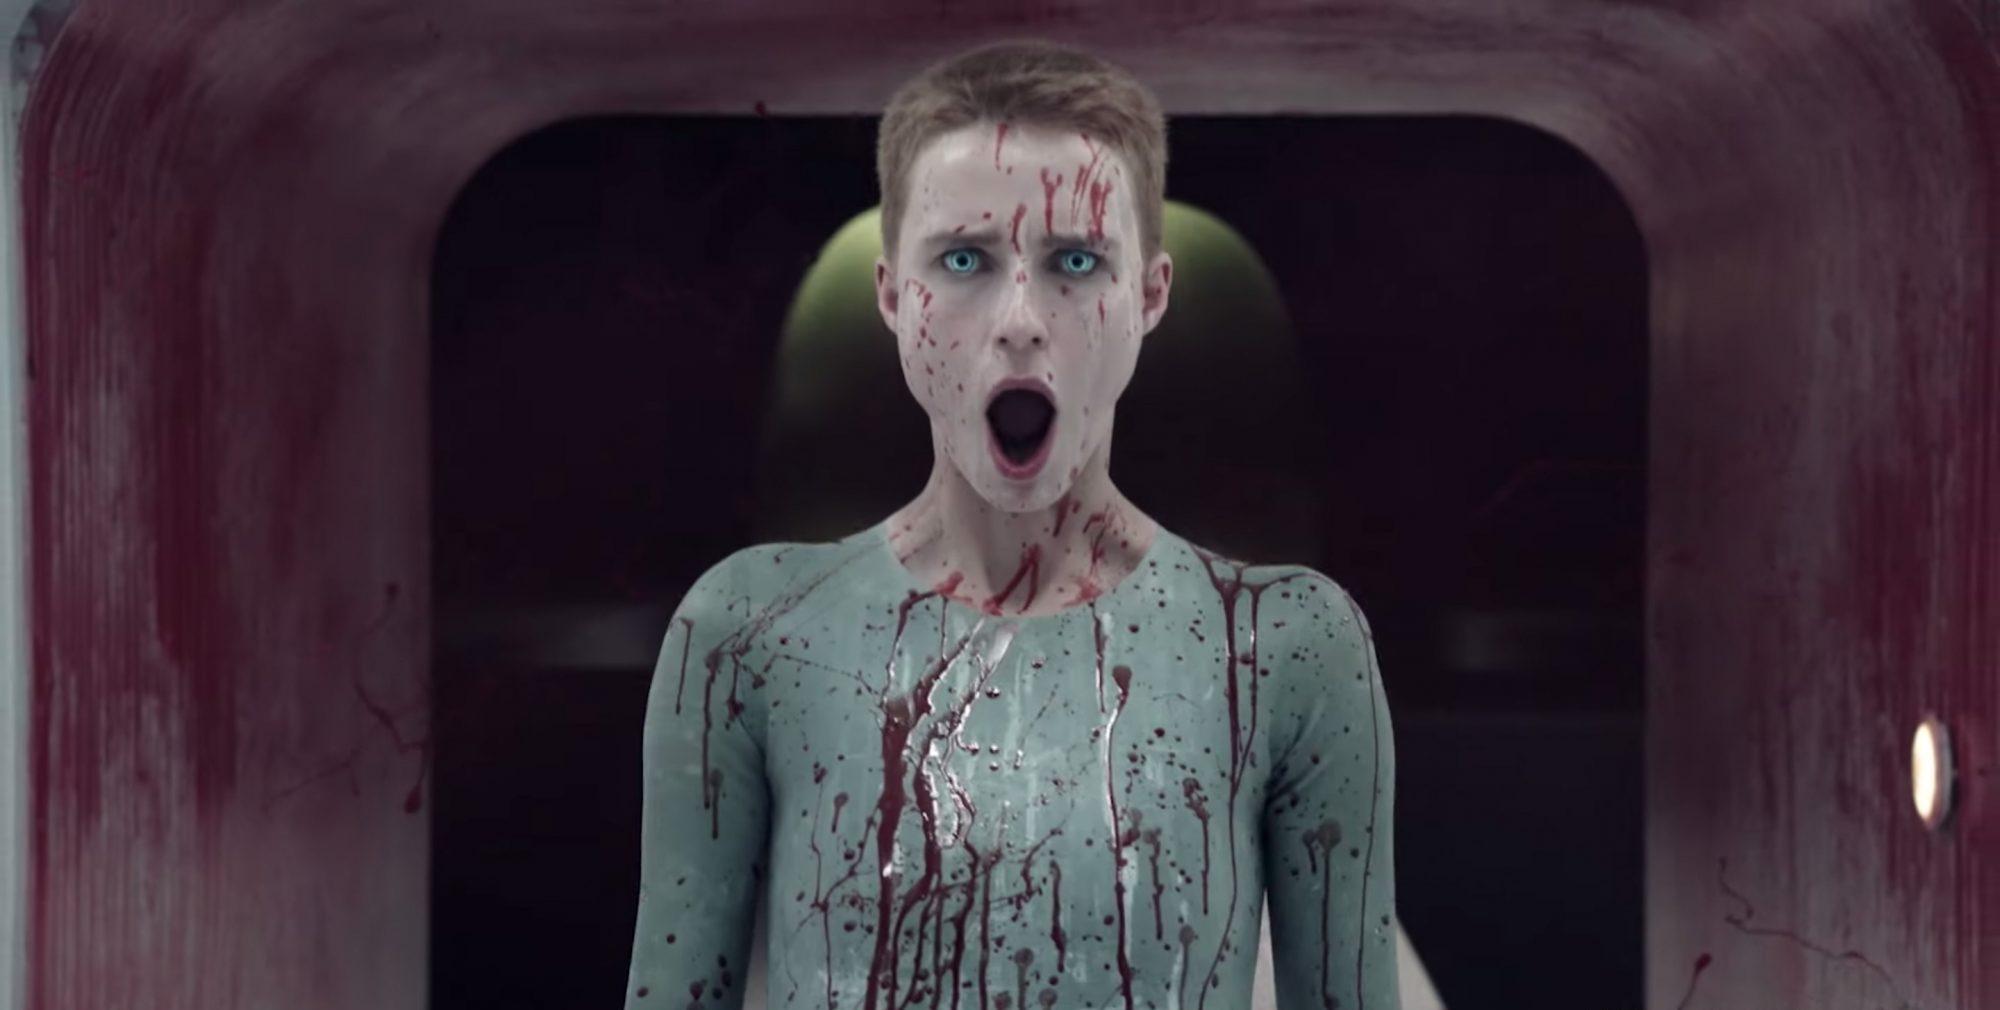 a bloodied woman screams